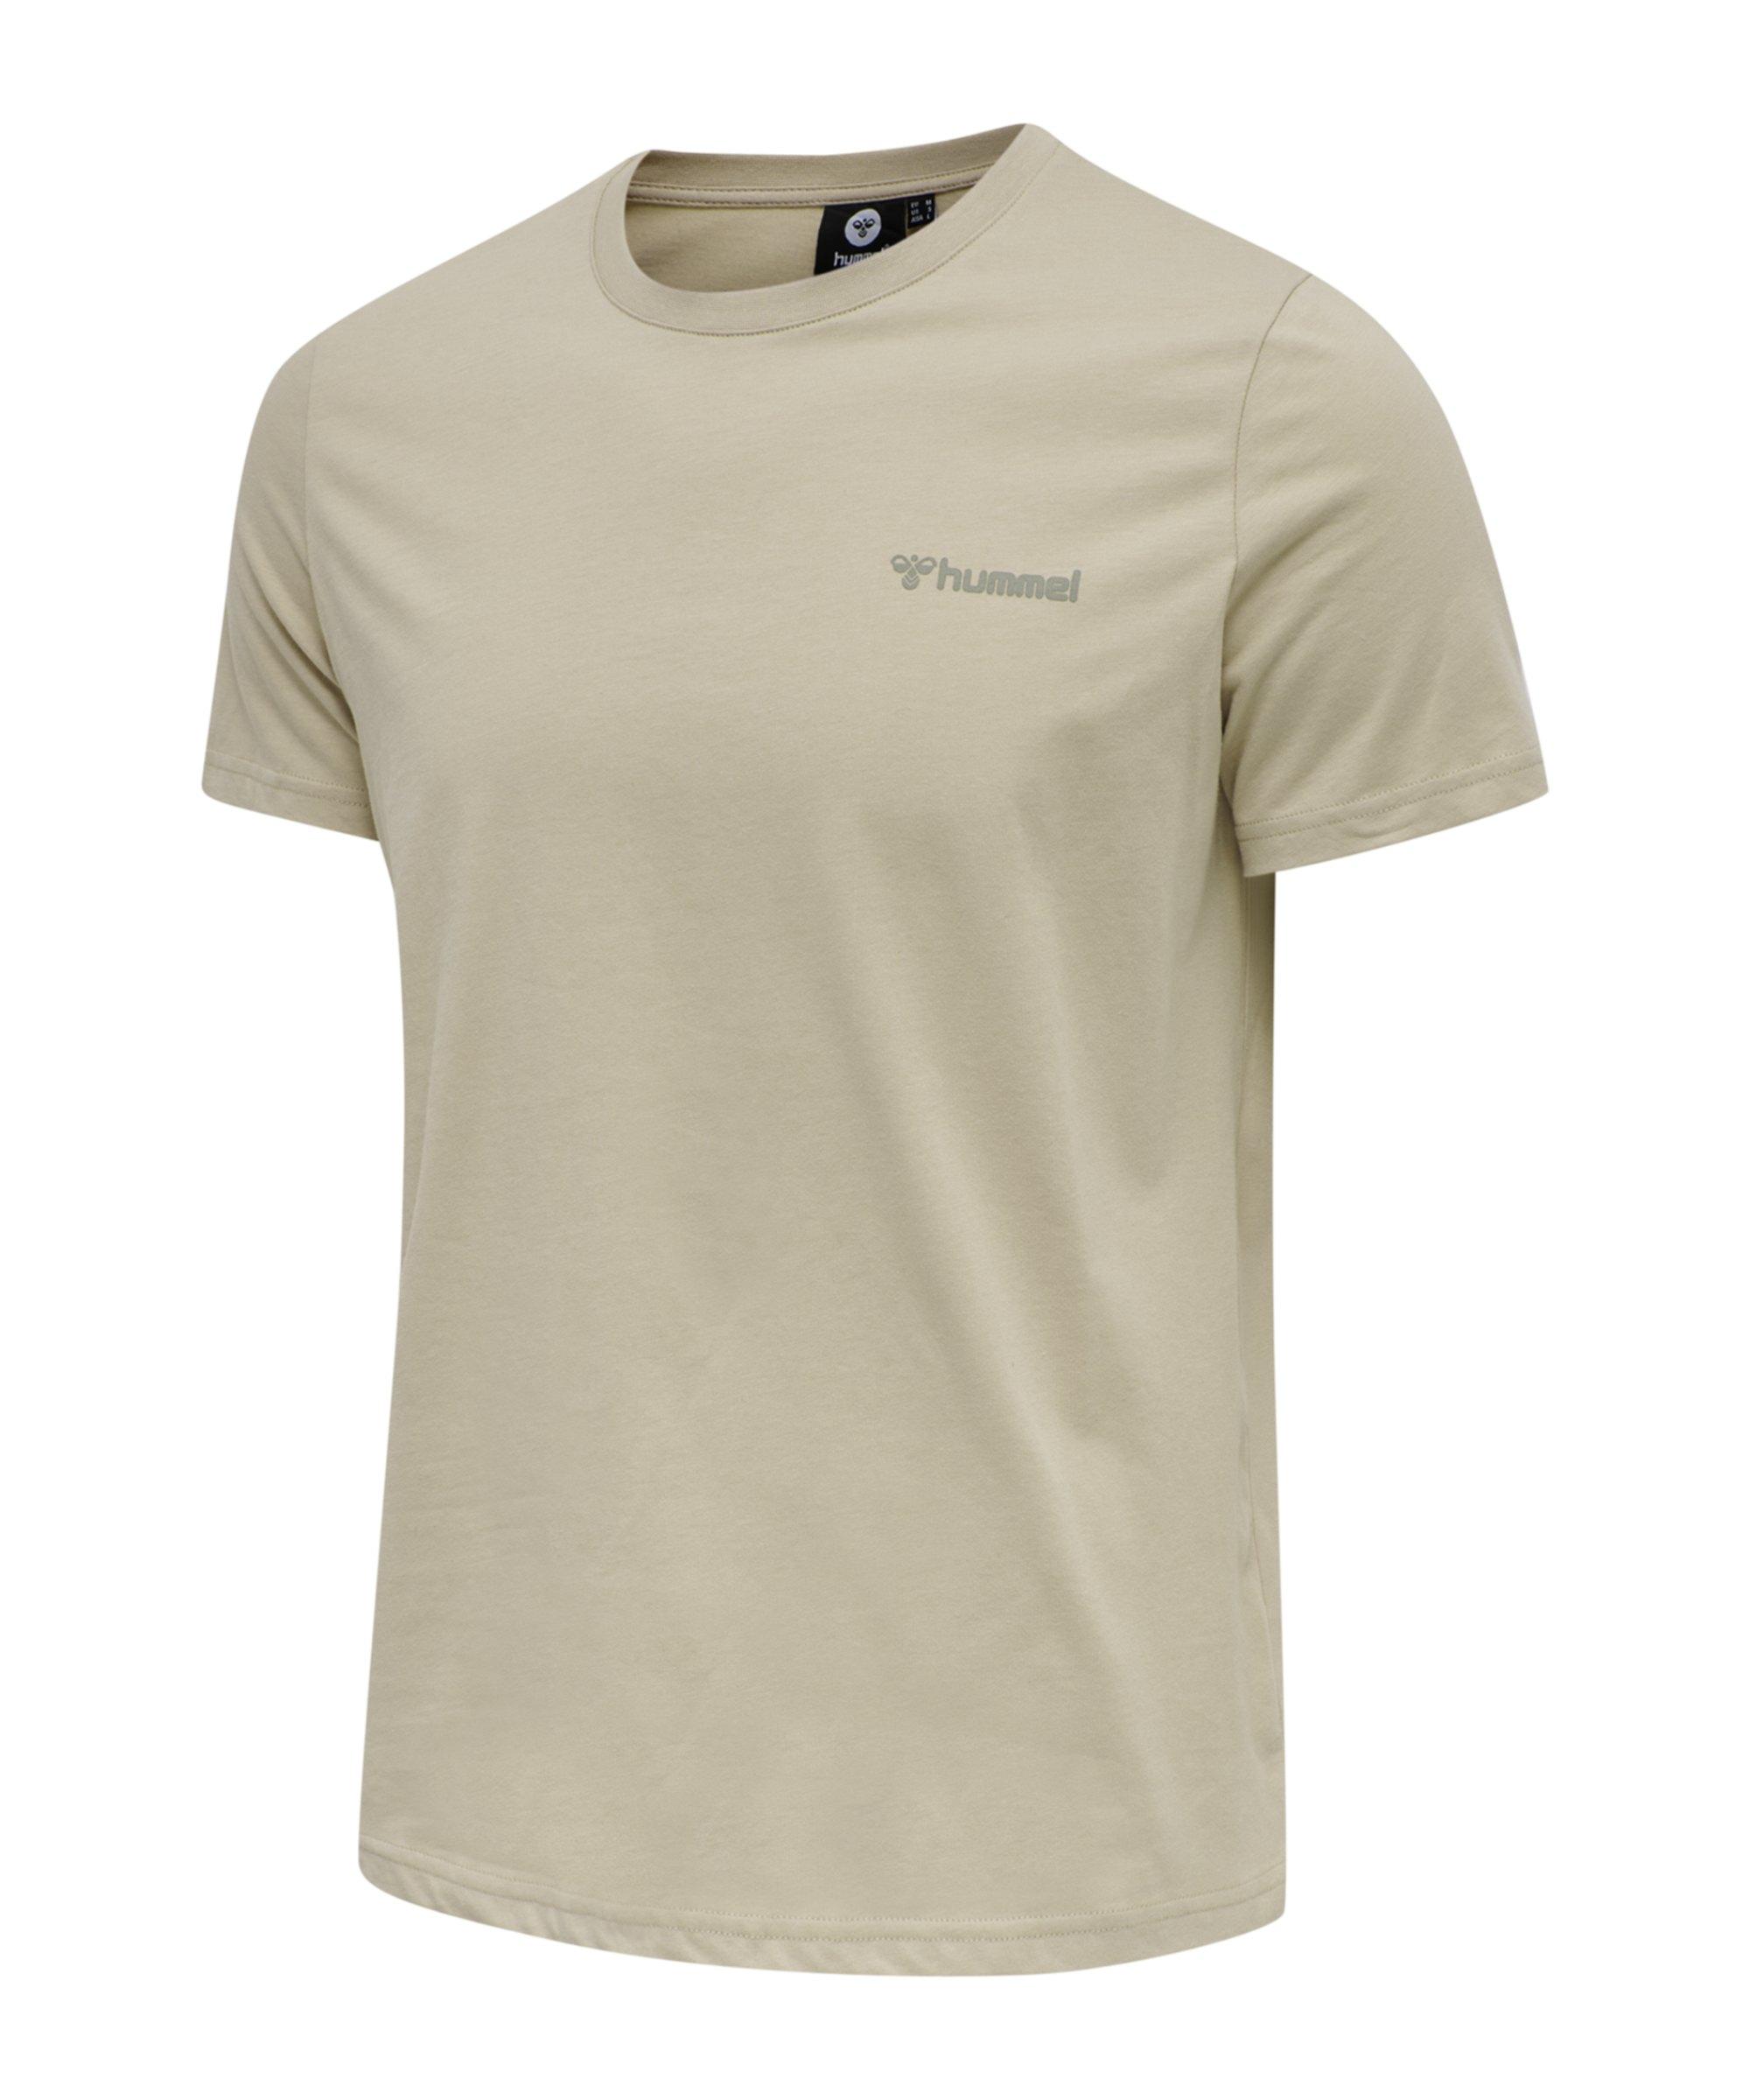 Hummel Toronto T-Shirt Braun F2189 - braun